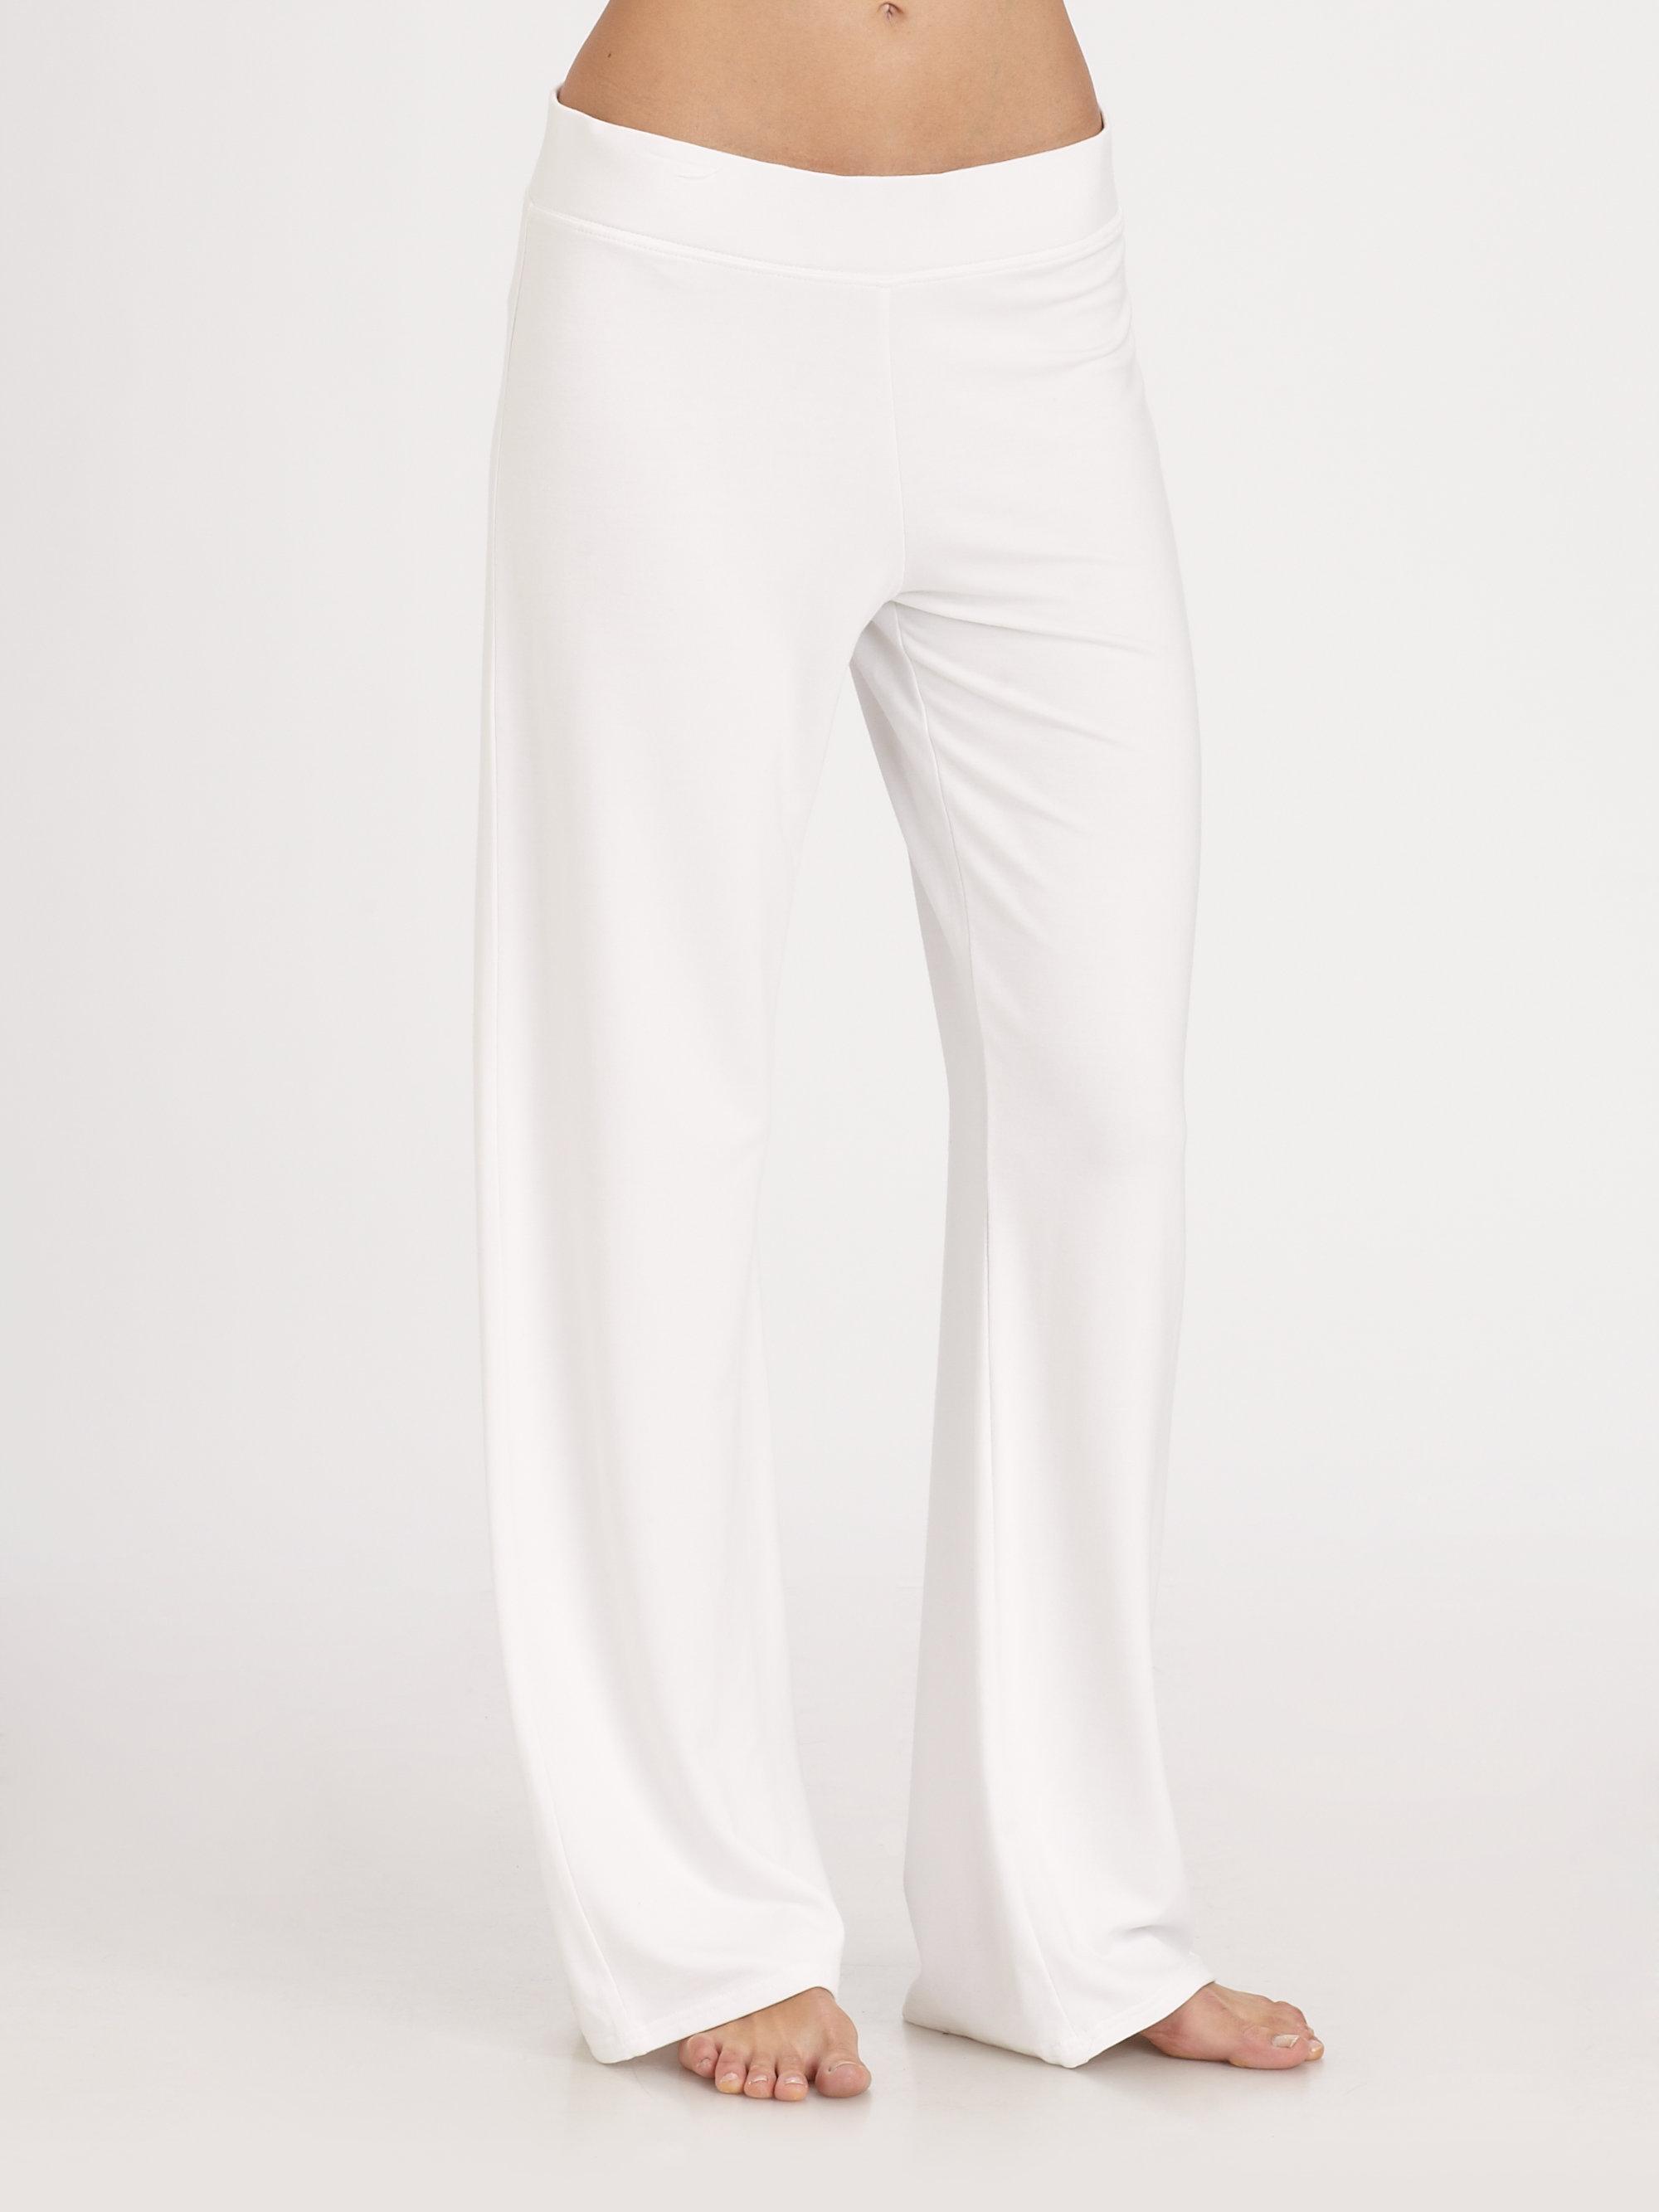 White Lounge Pants Si Pant